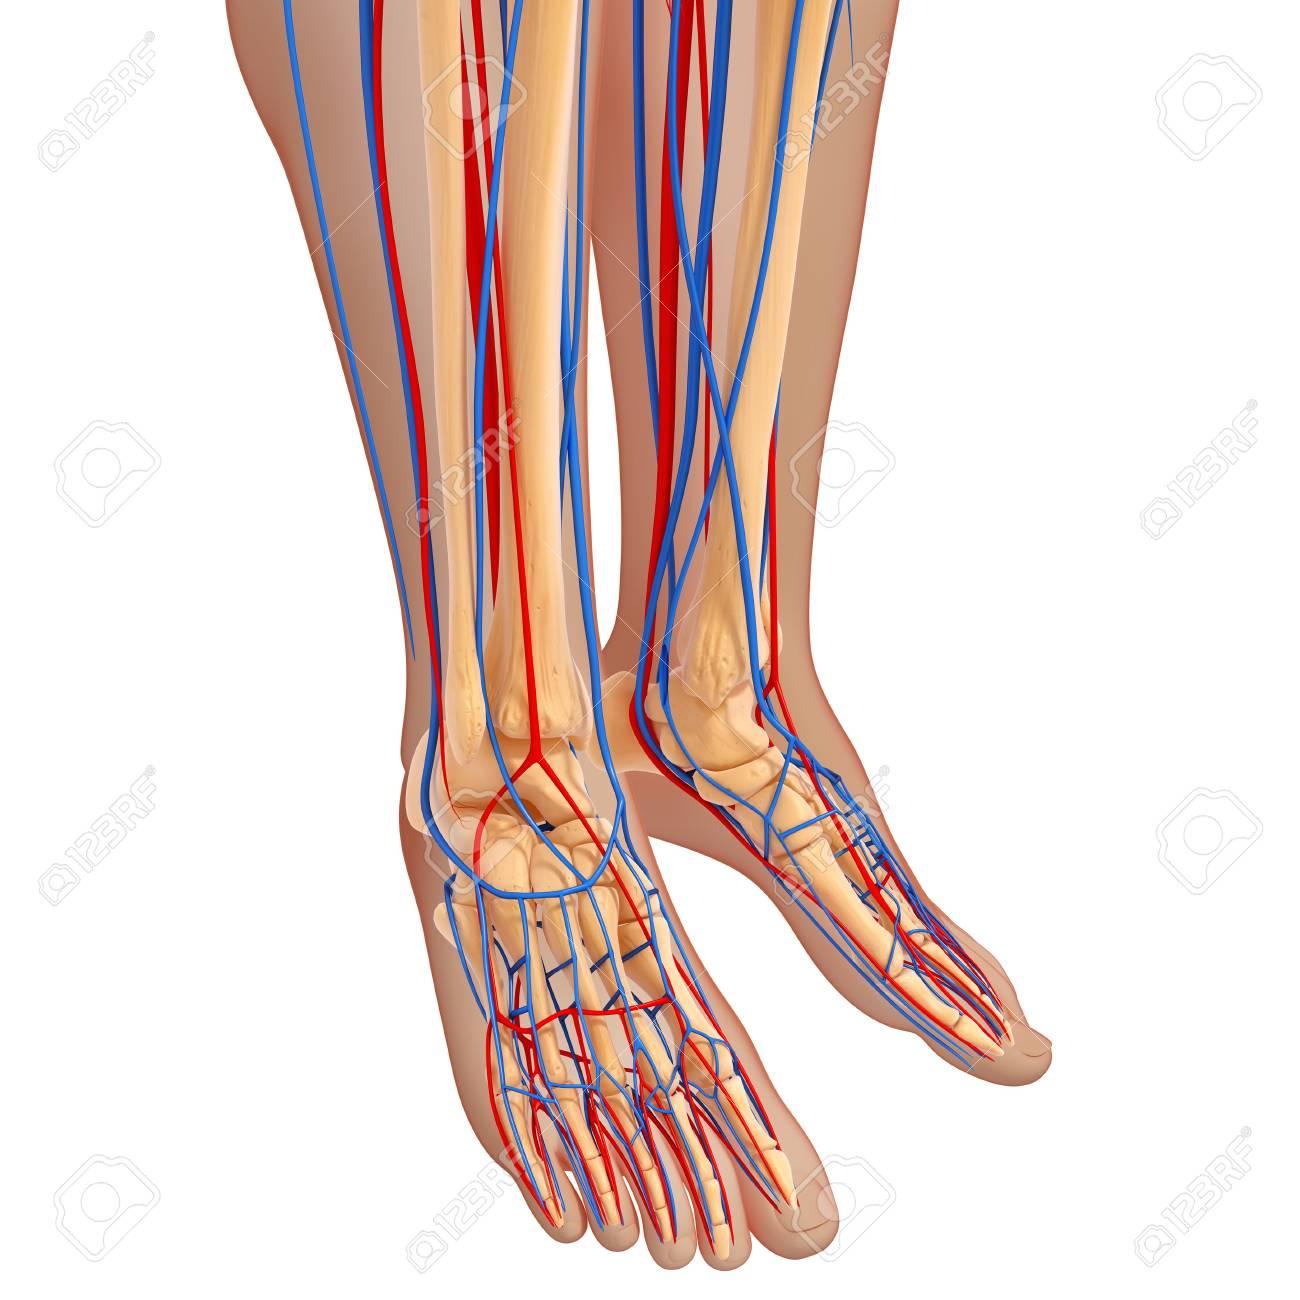 Lower Leg Anatomyartwork Stock Photo Picture And Royalty Free